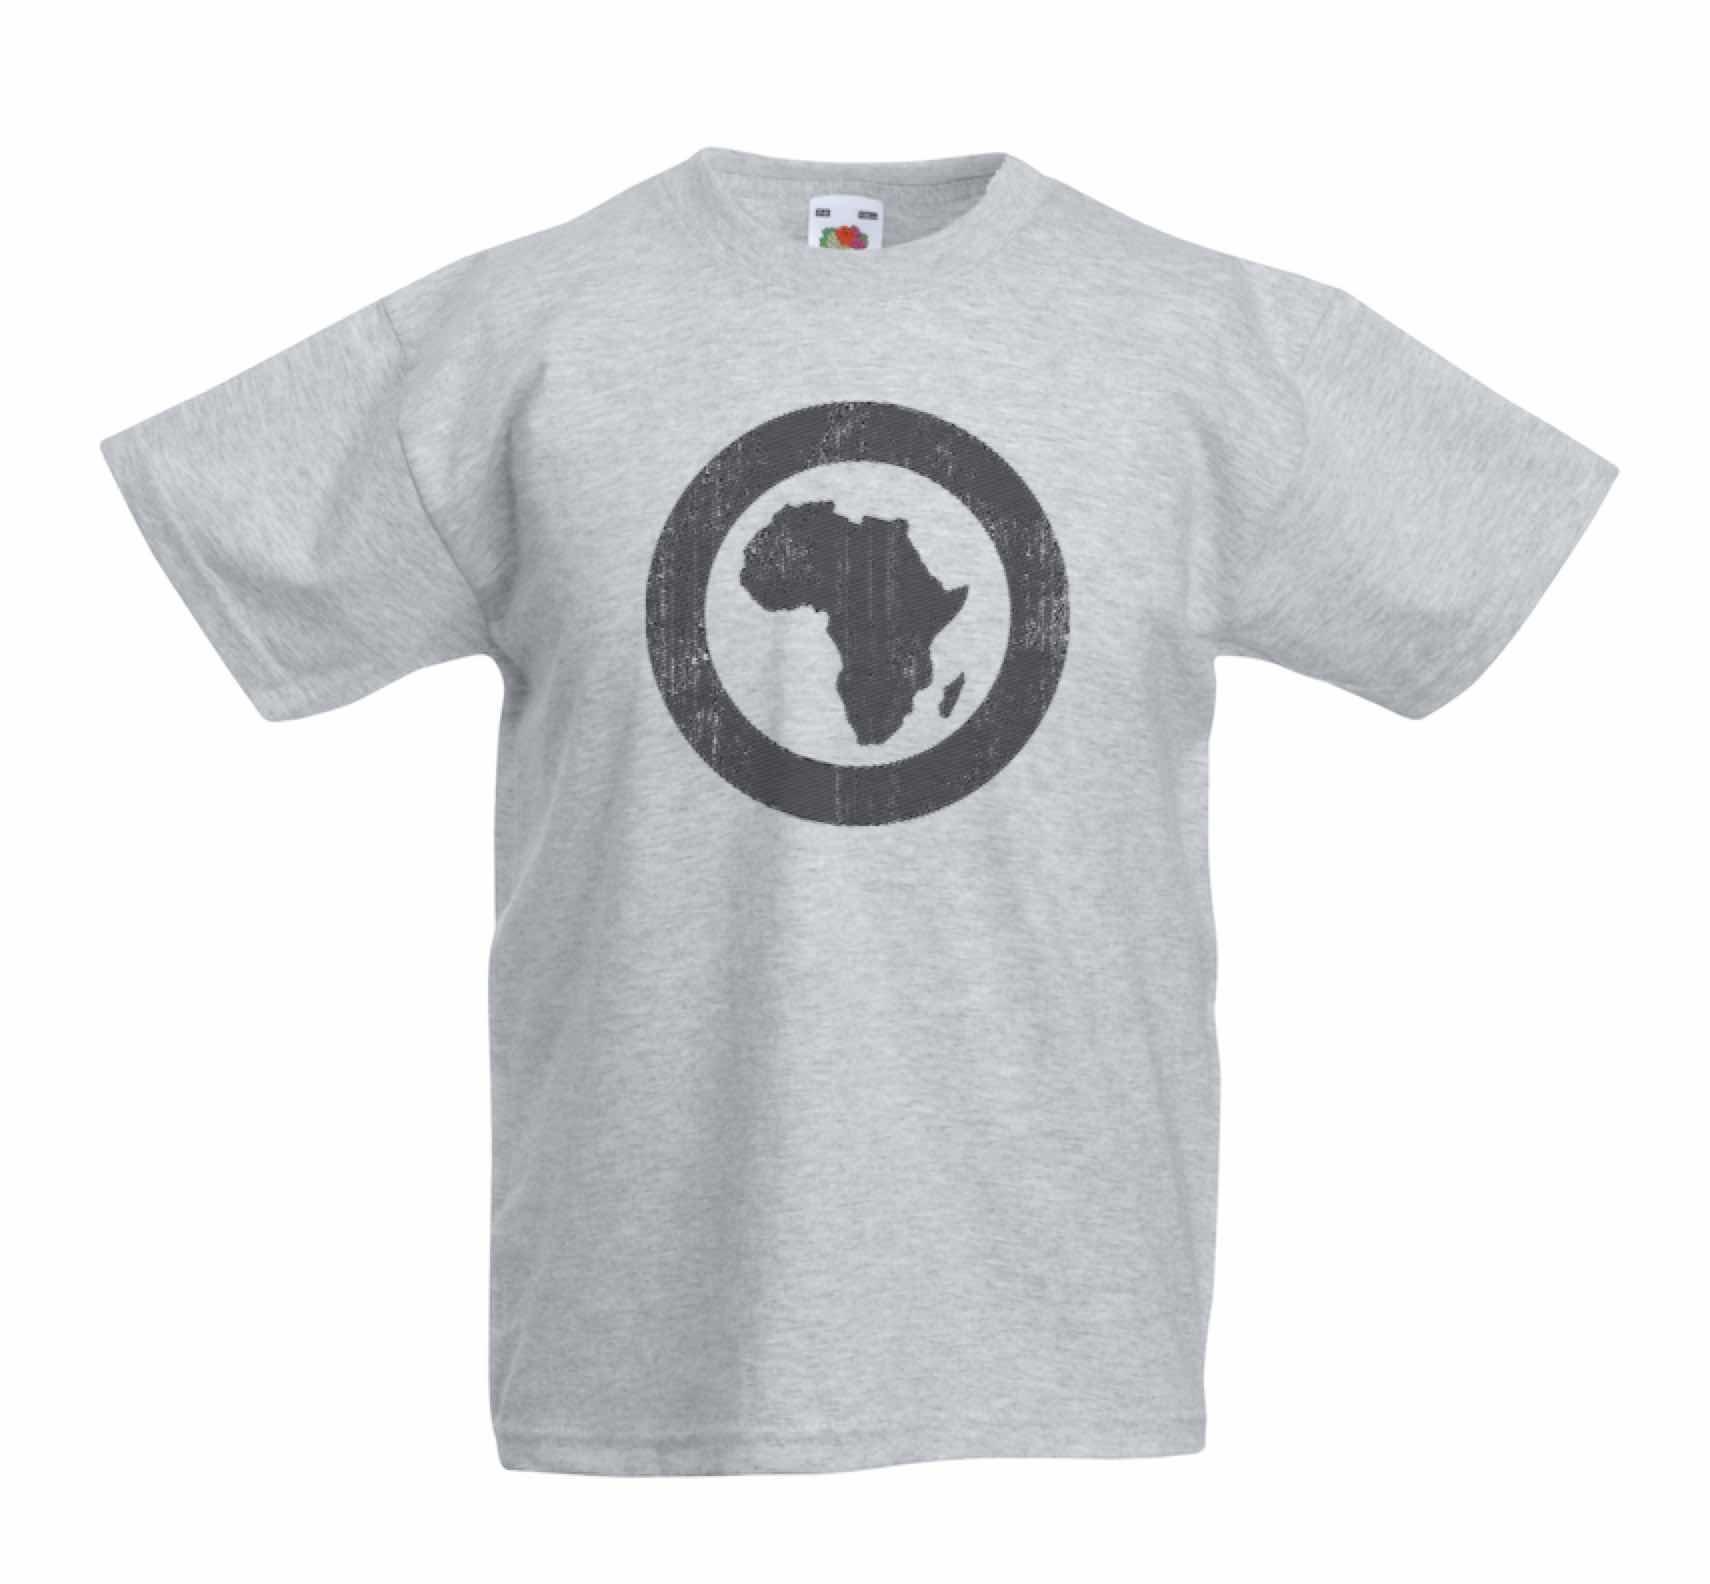 African Motif design for t-shirt, hoodie & sweatshirt